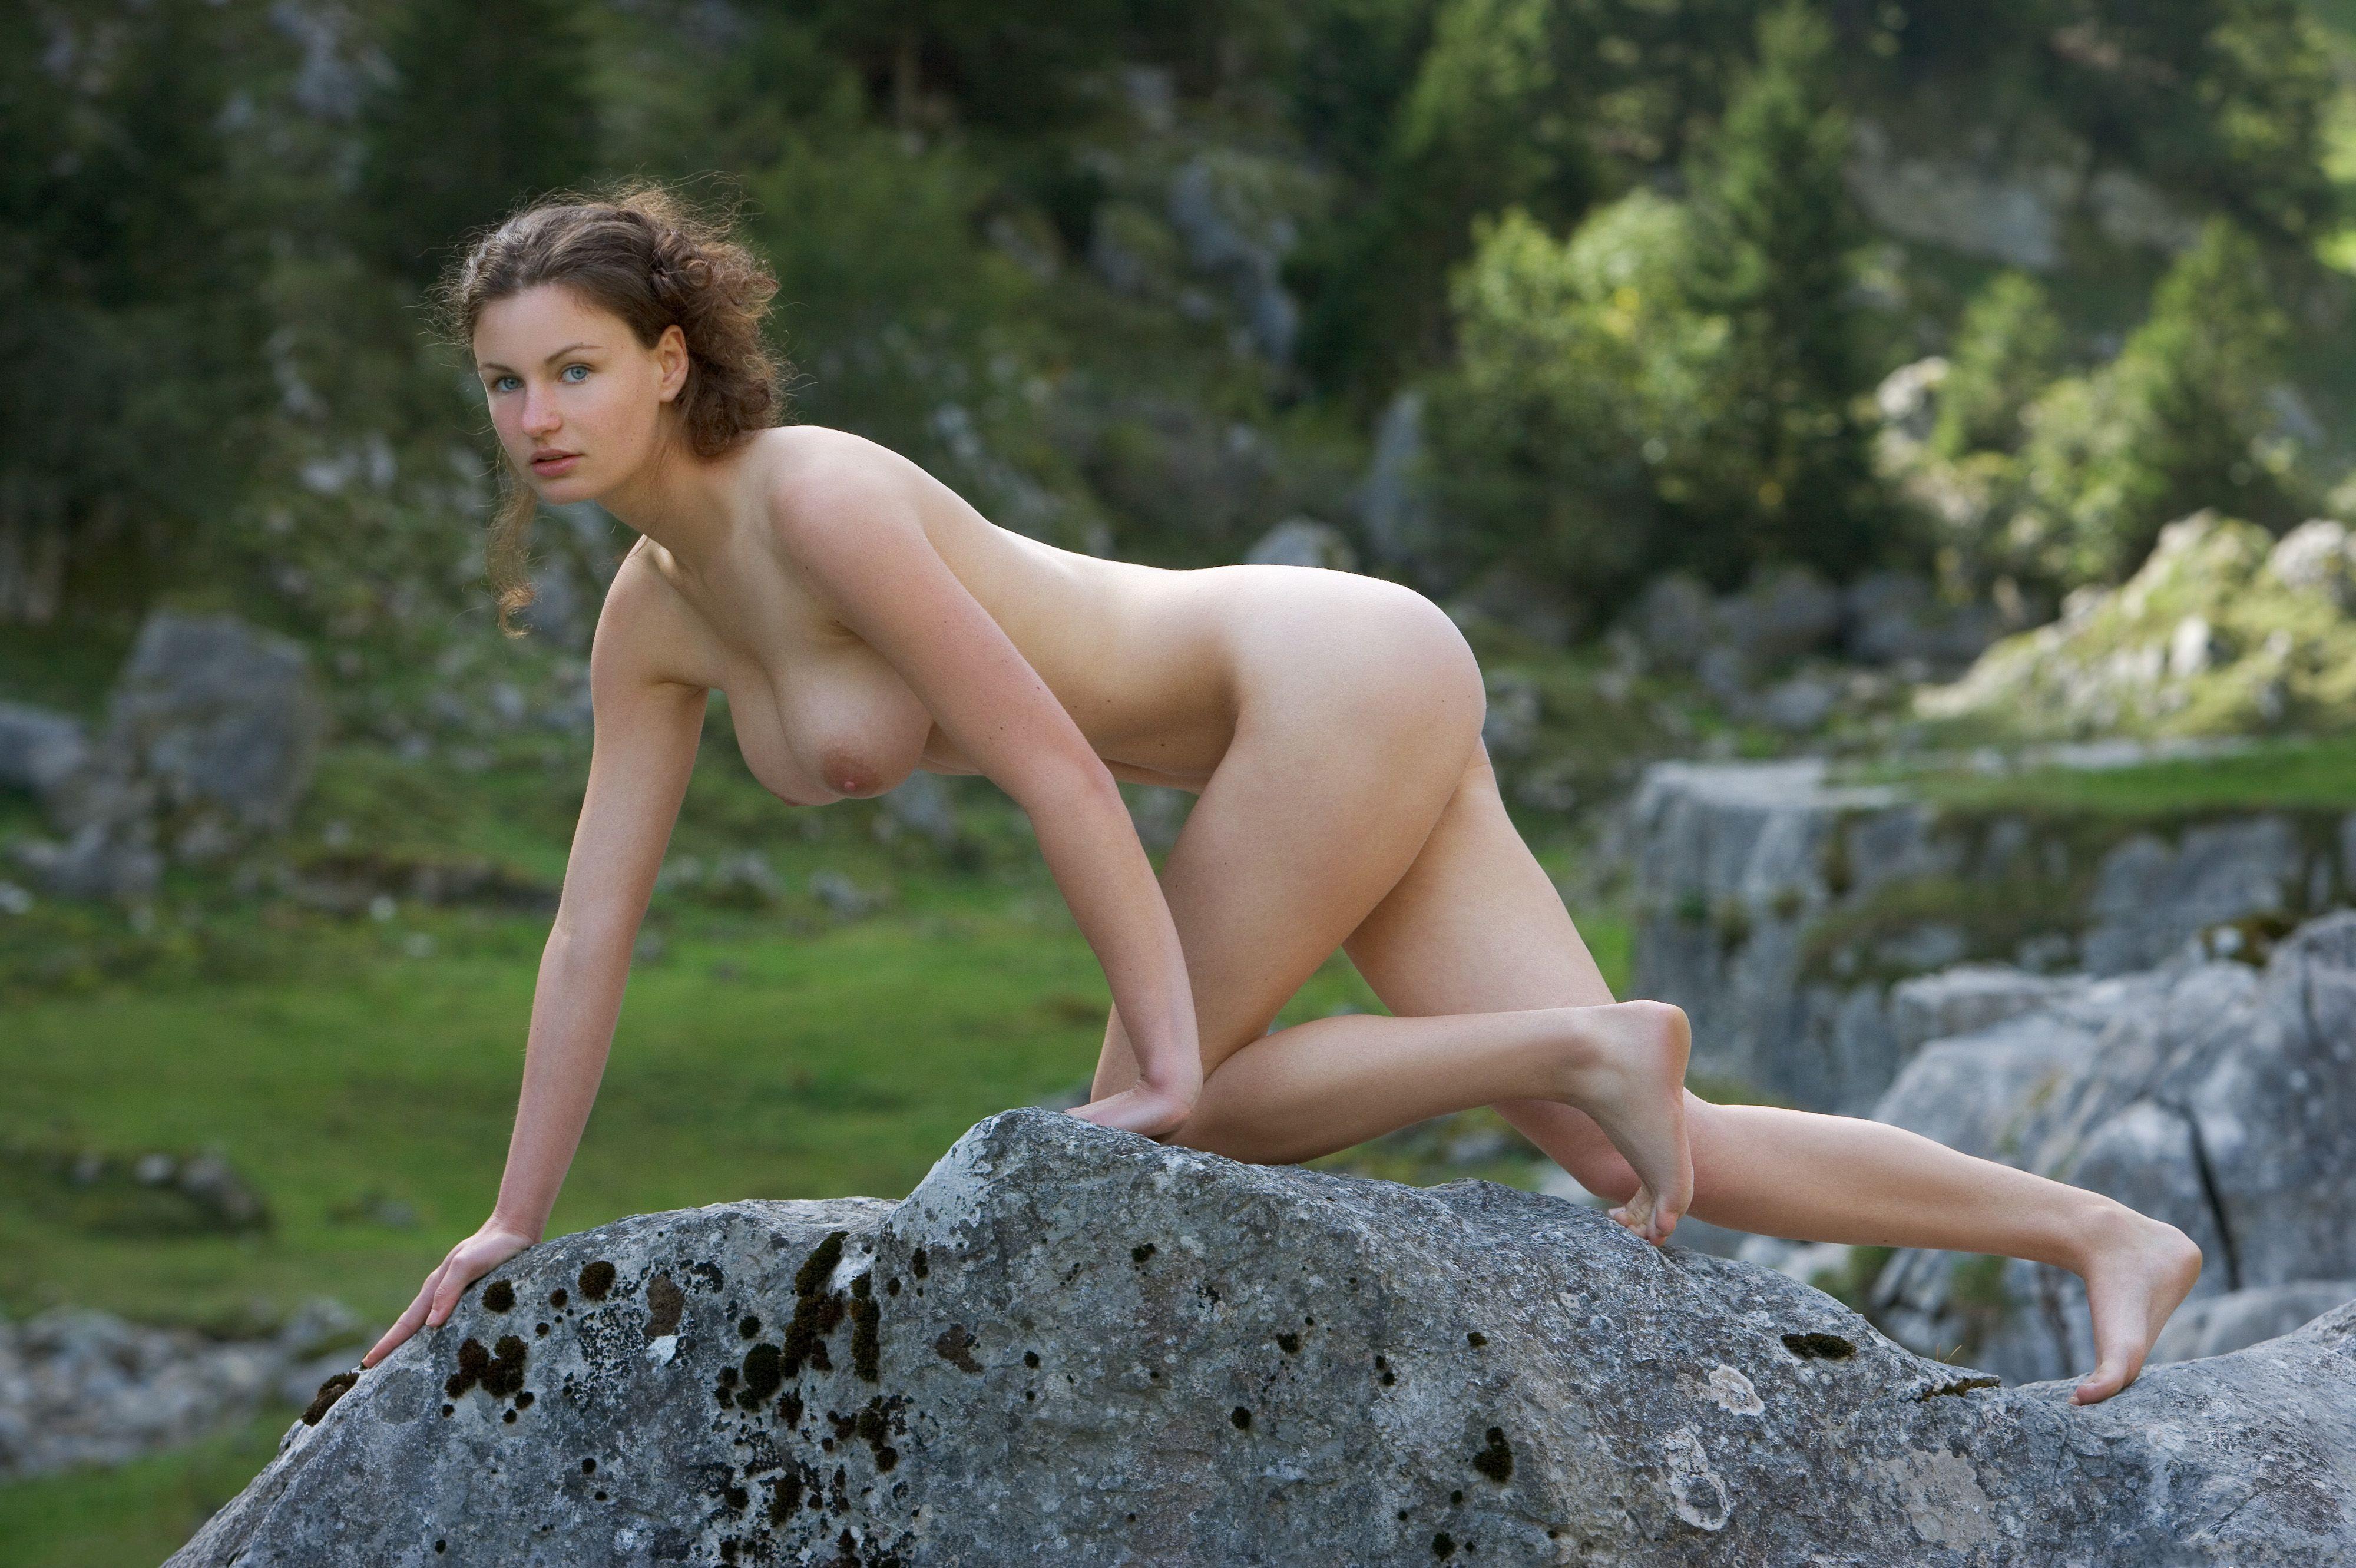 Шатенка голая на природе 10 фотография